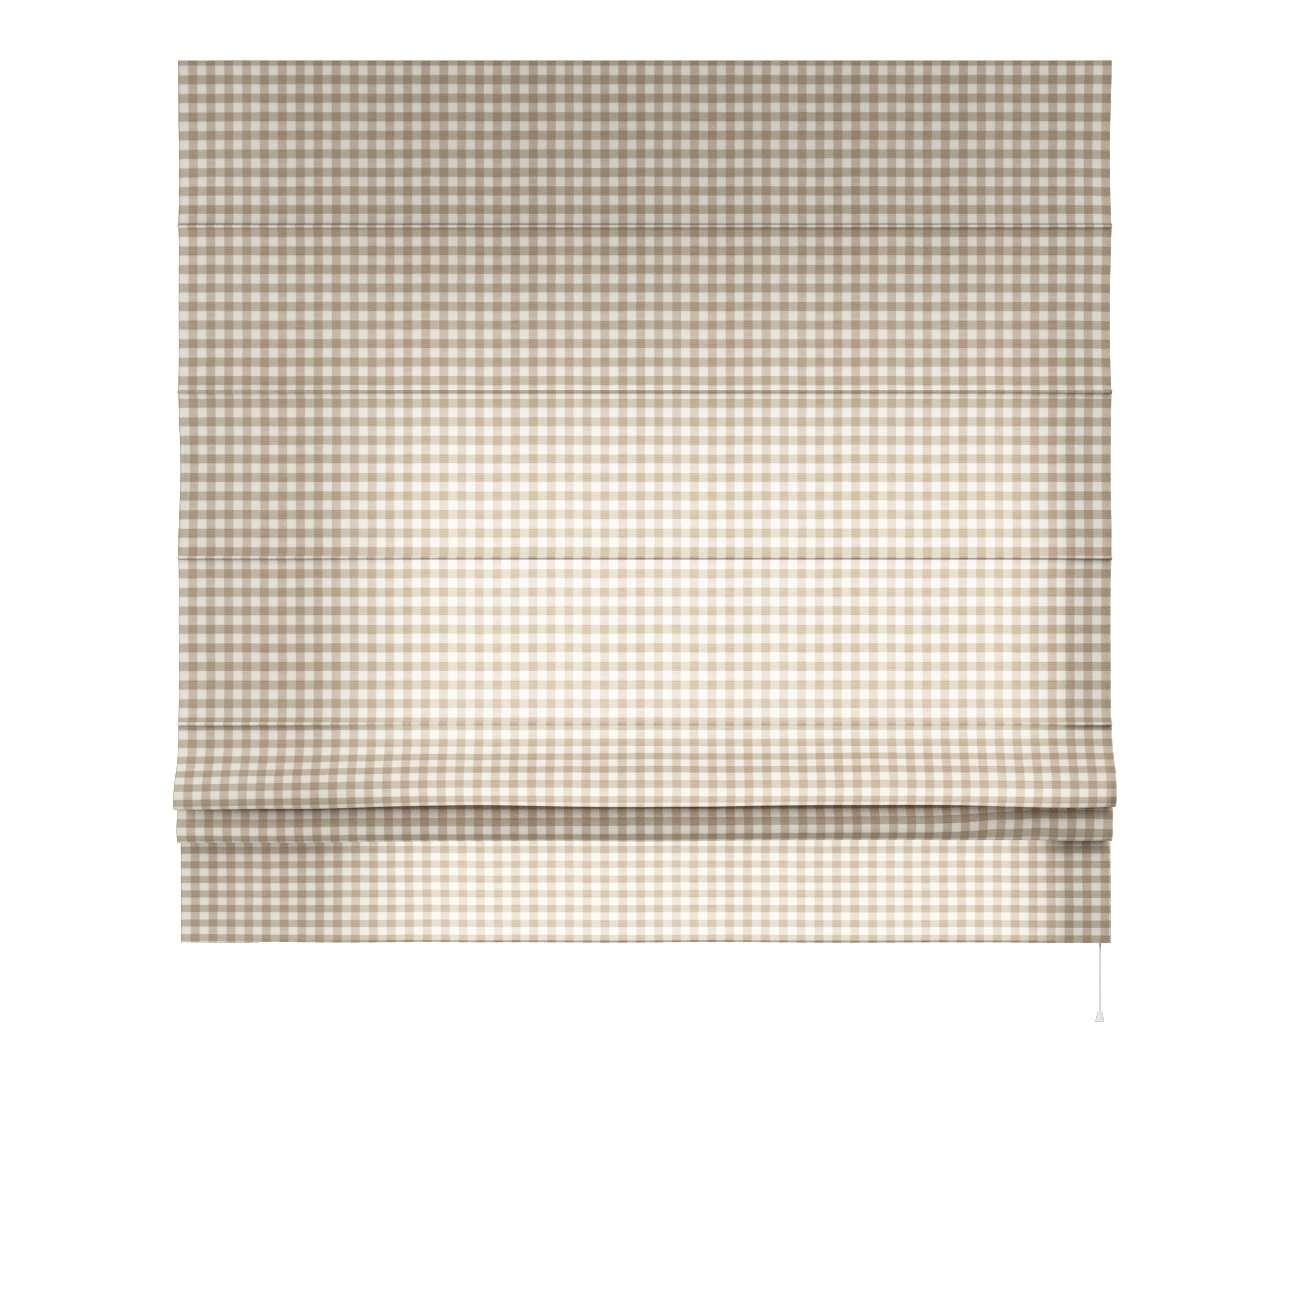 Romanetės Padva 80 x 170 cm (plotis x ilgis) kolekcijoje Quadro, audinys: 136-06